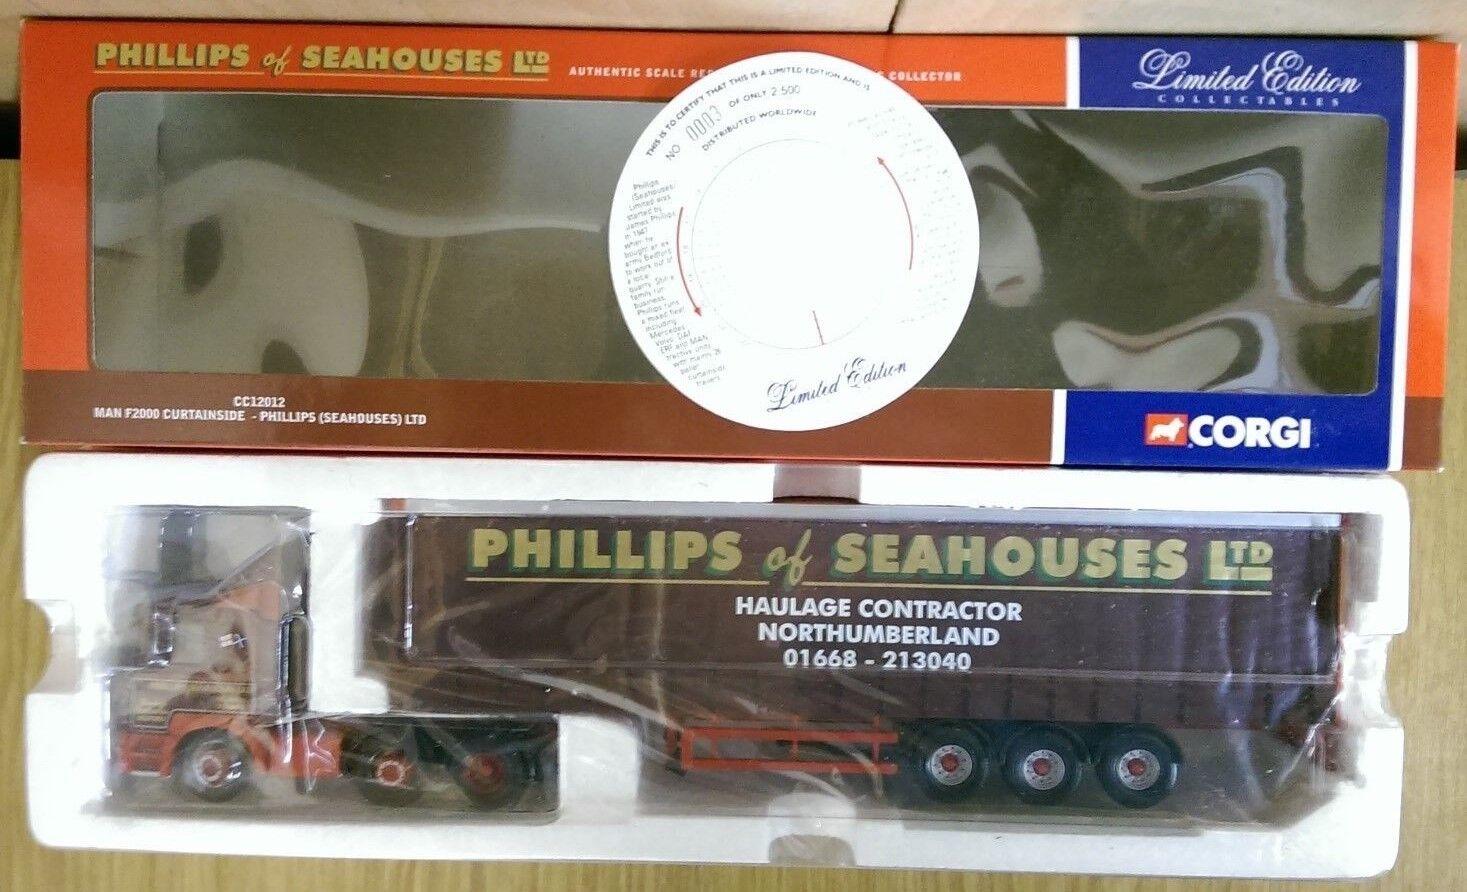 Corgi CC12012 MAN F2000 Curtainside Phillips (Seahouses) Ltd Ed No. 0003 of 2500